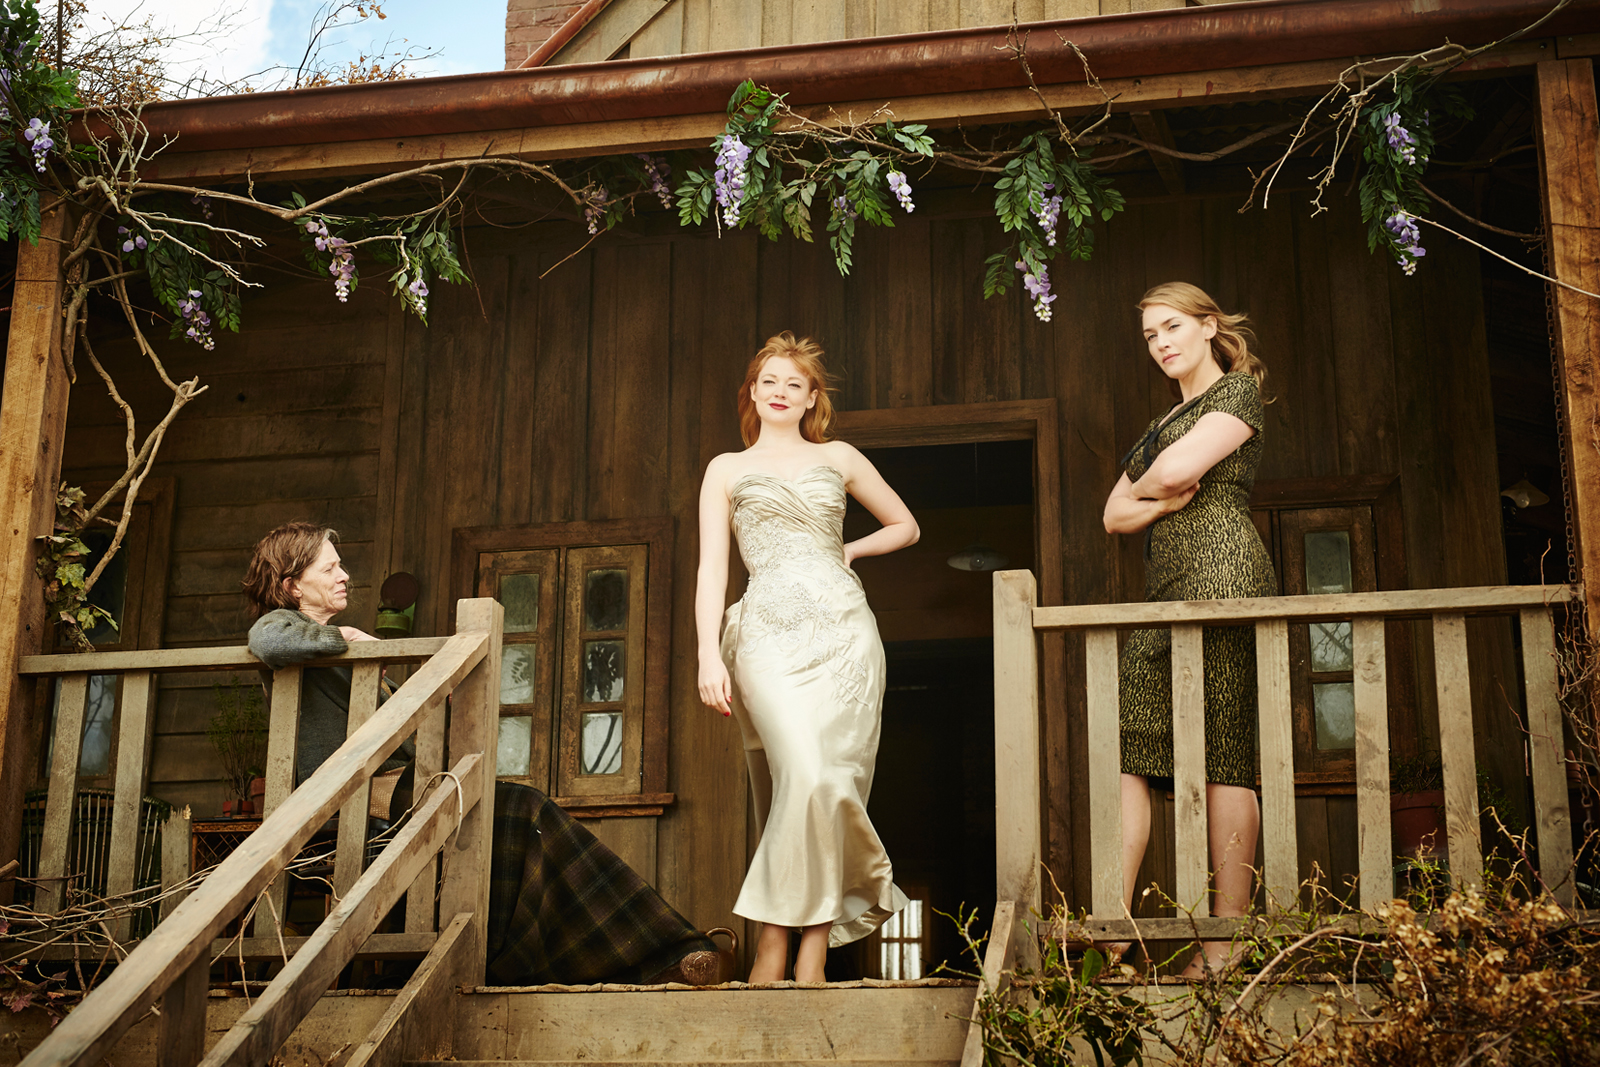 the-dressmaker-film 4